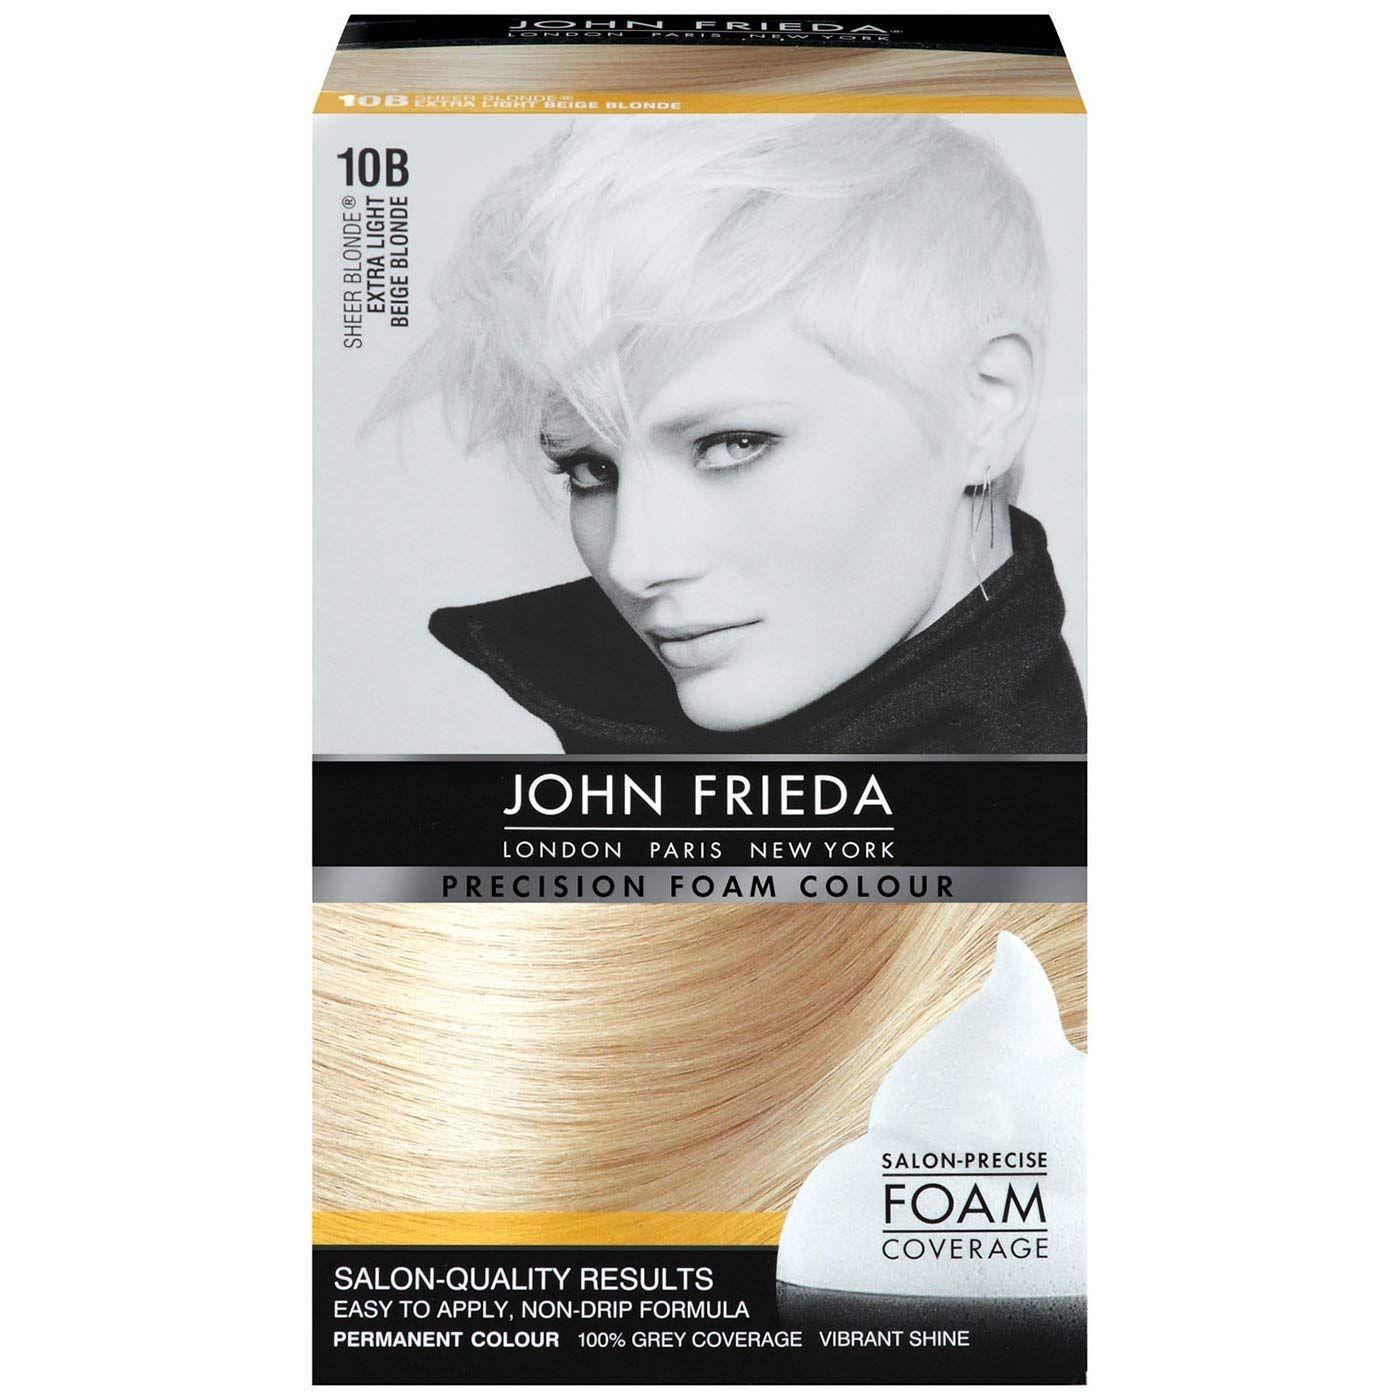 John Frieda Precision Foam Colour Extra Light Beige Blonde 10b